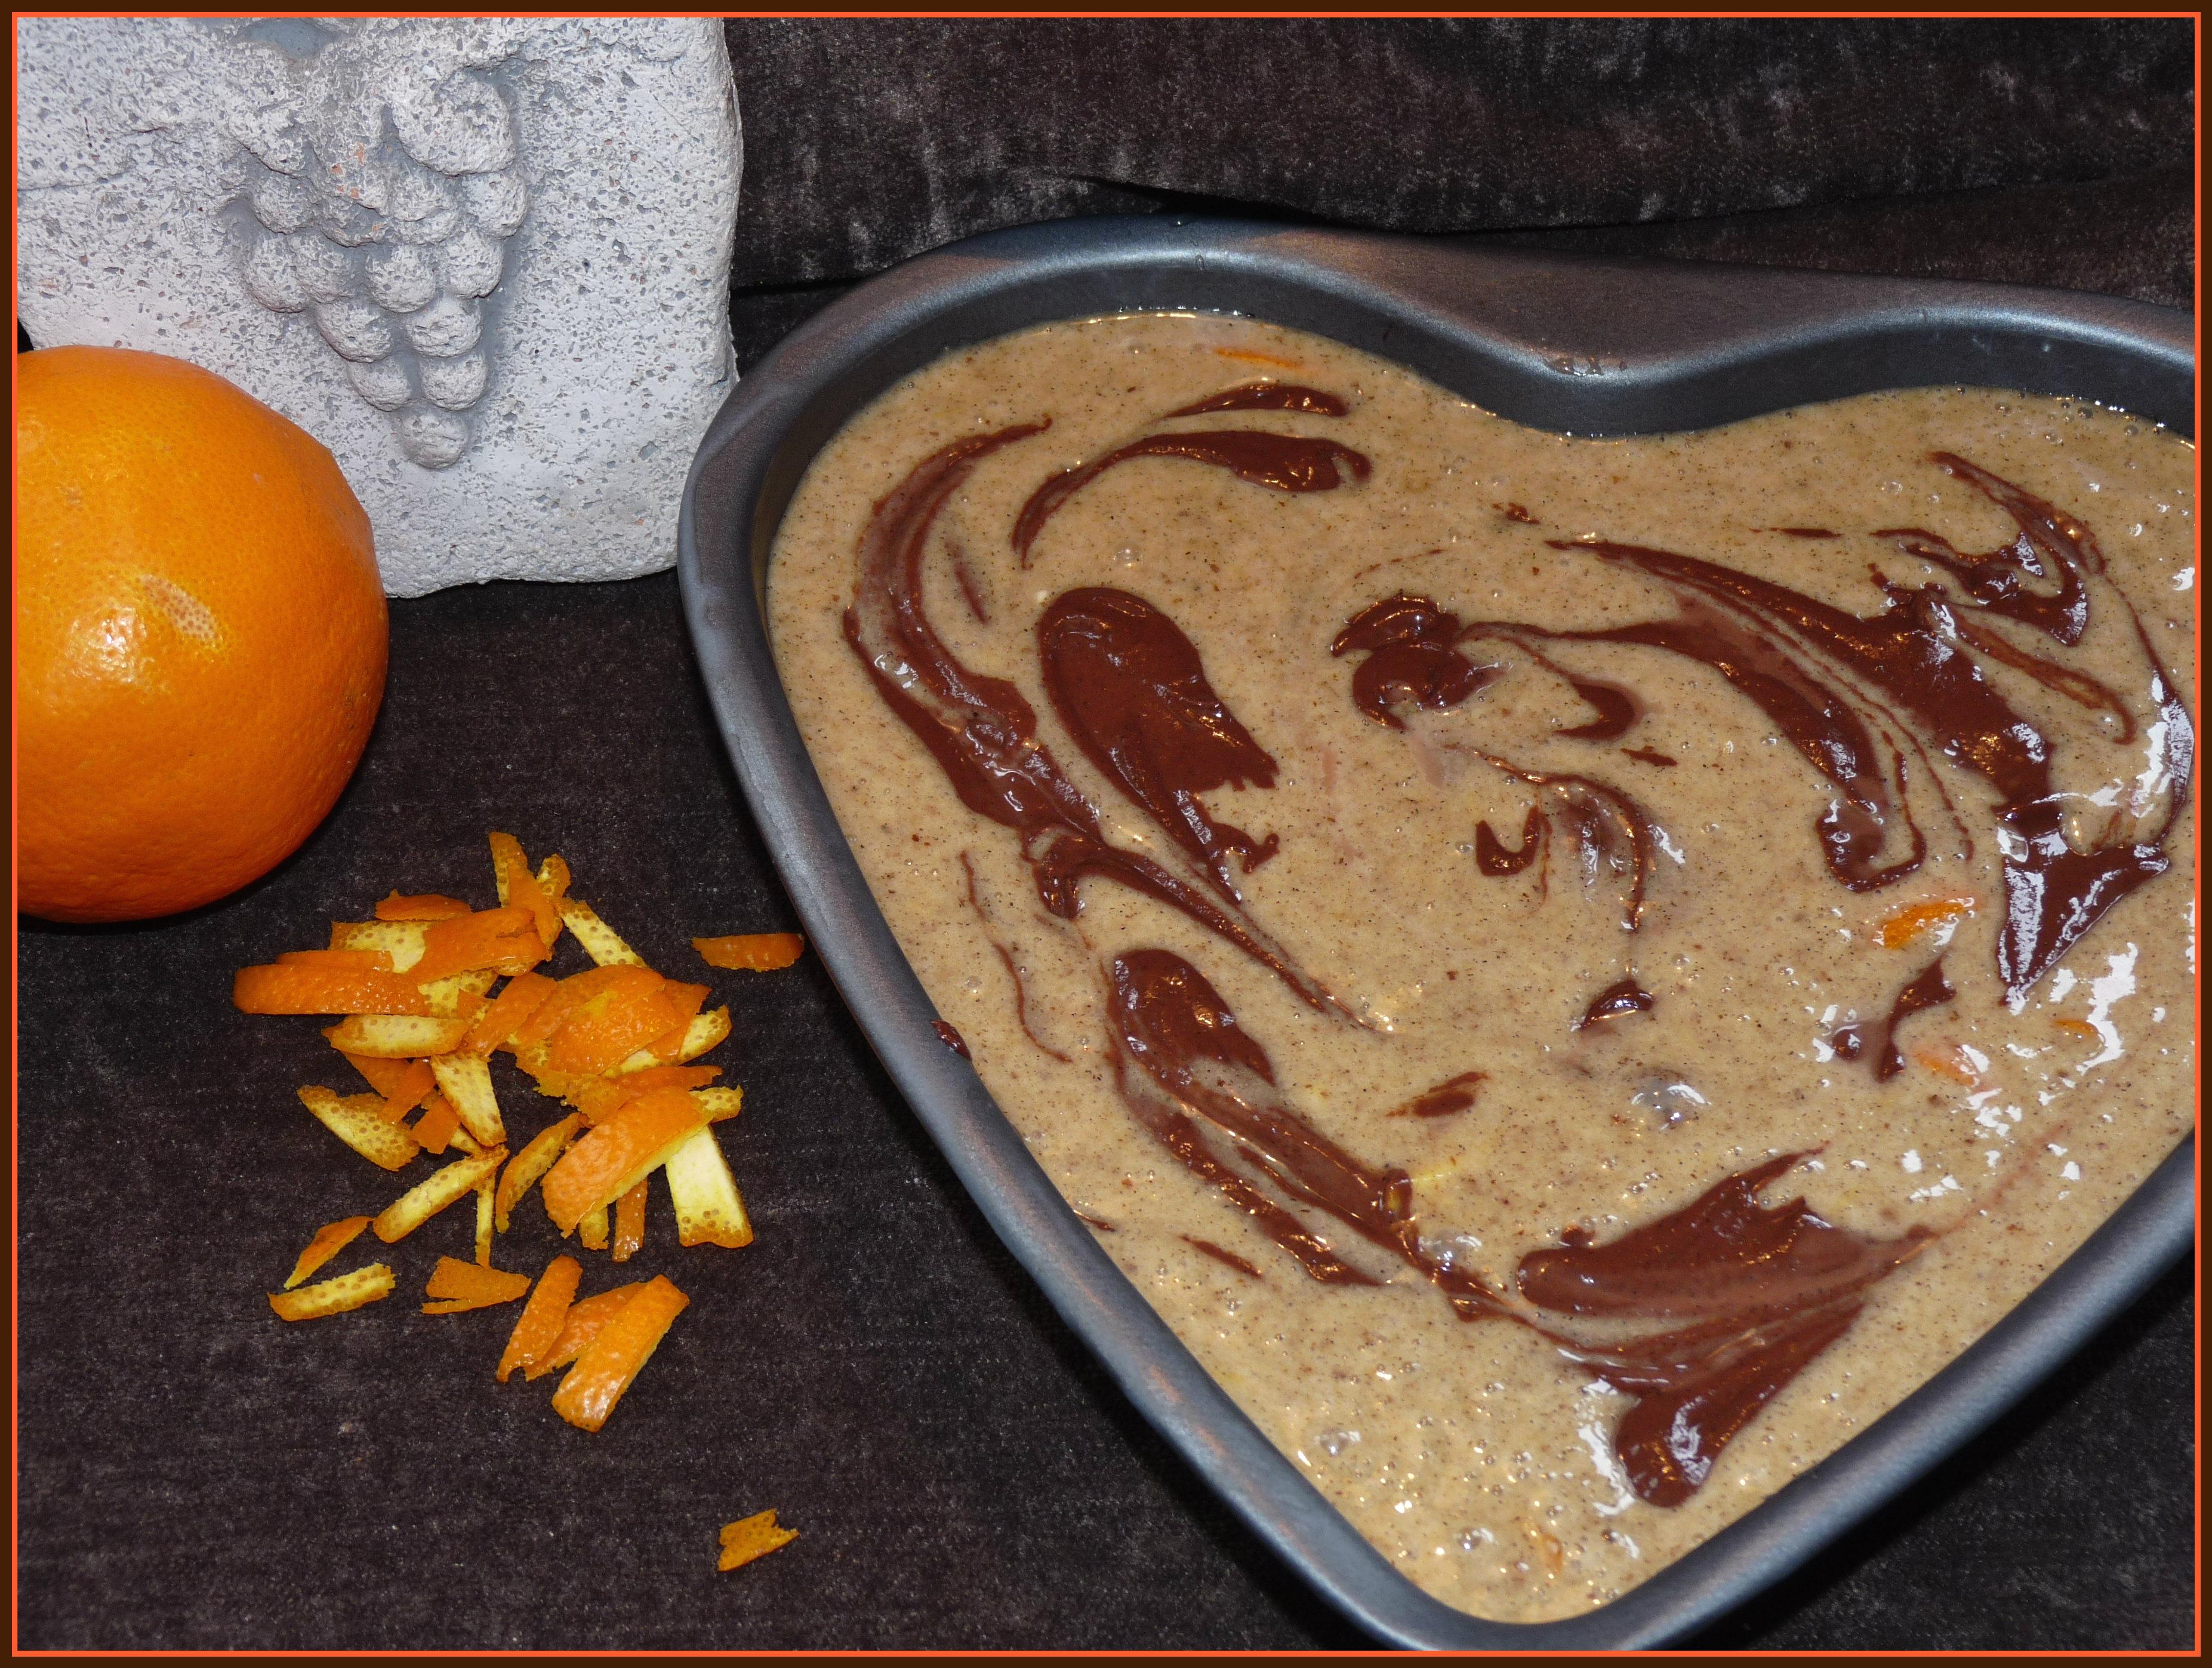 Herzform Kuchen Rezepte Schoko Home Image Ideen